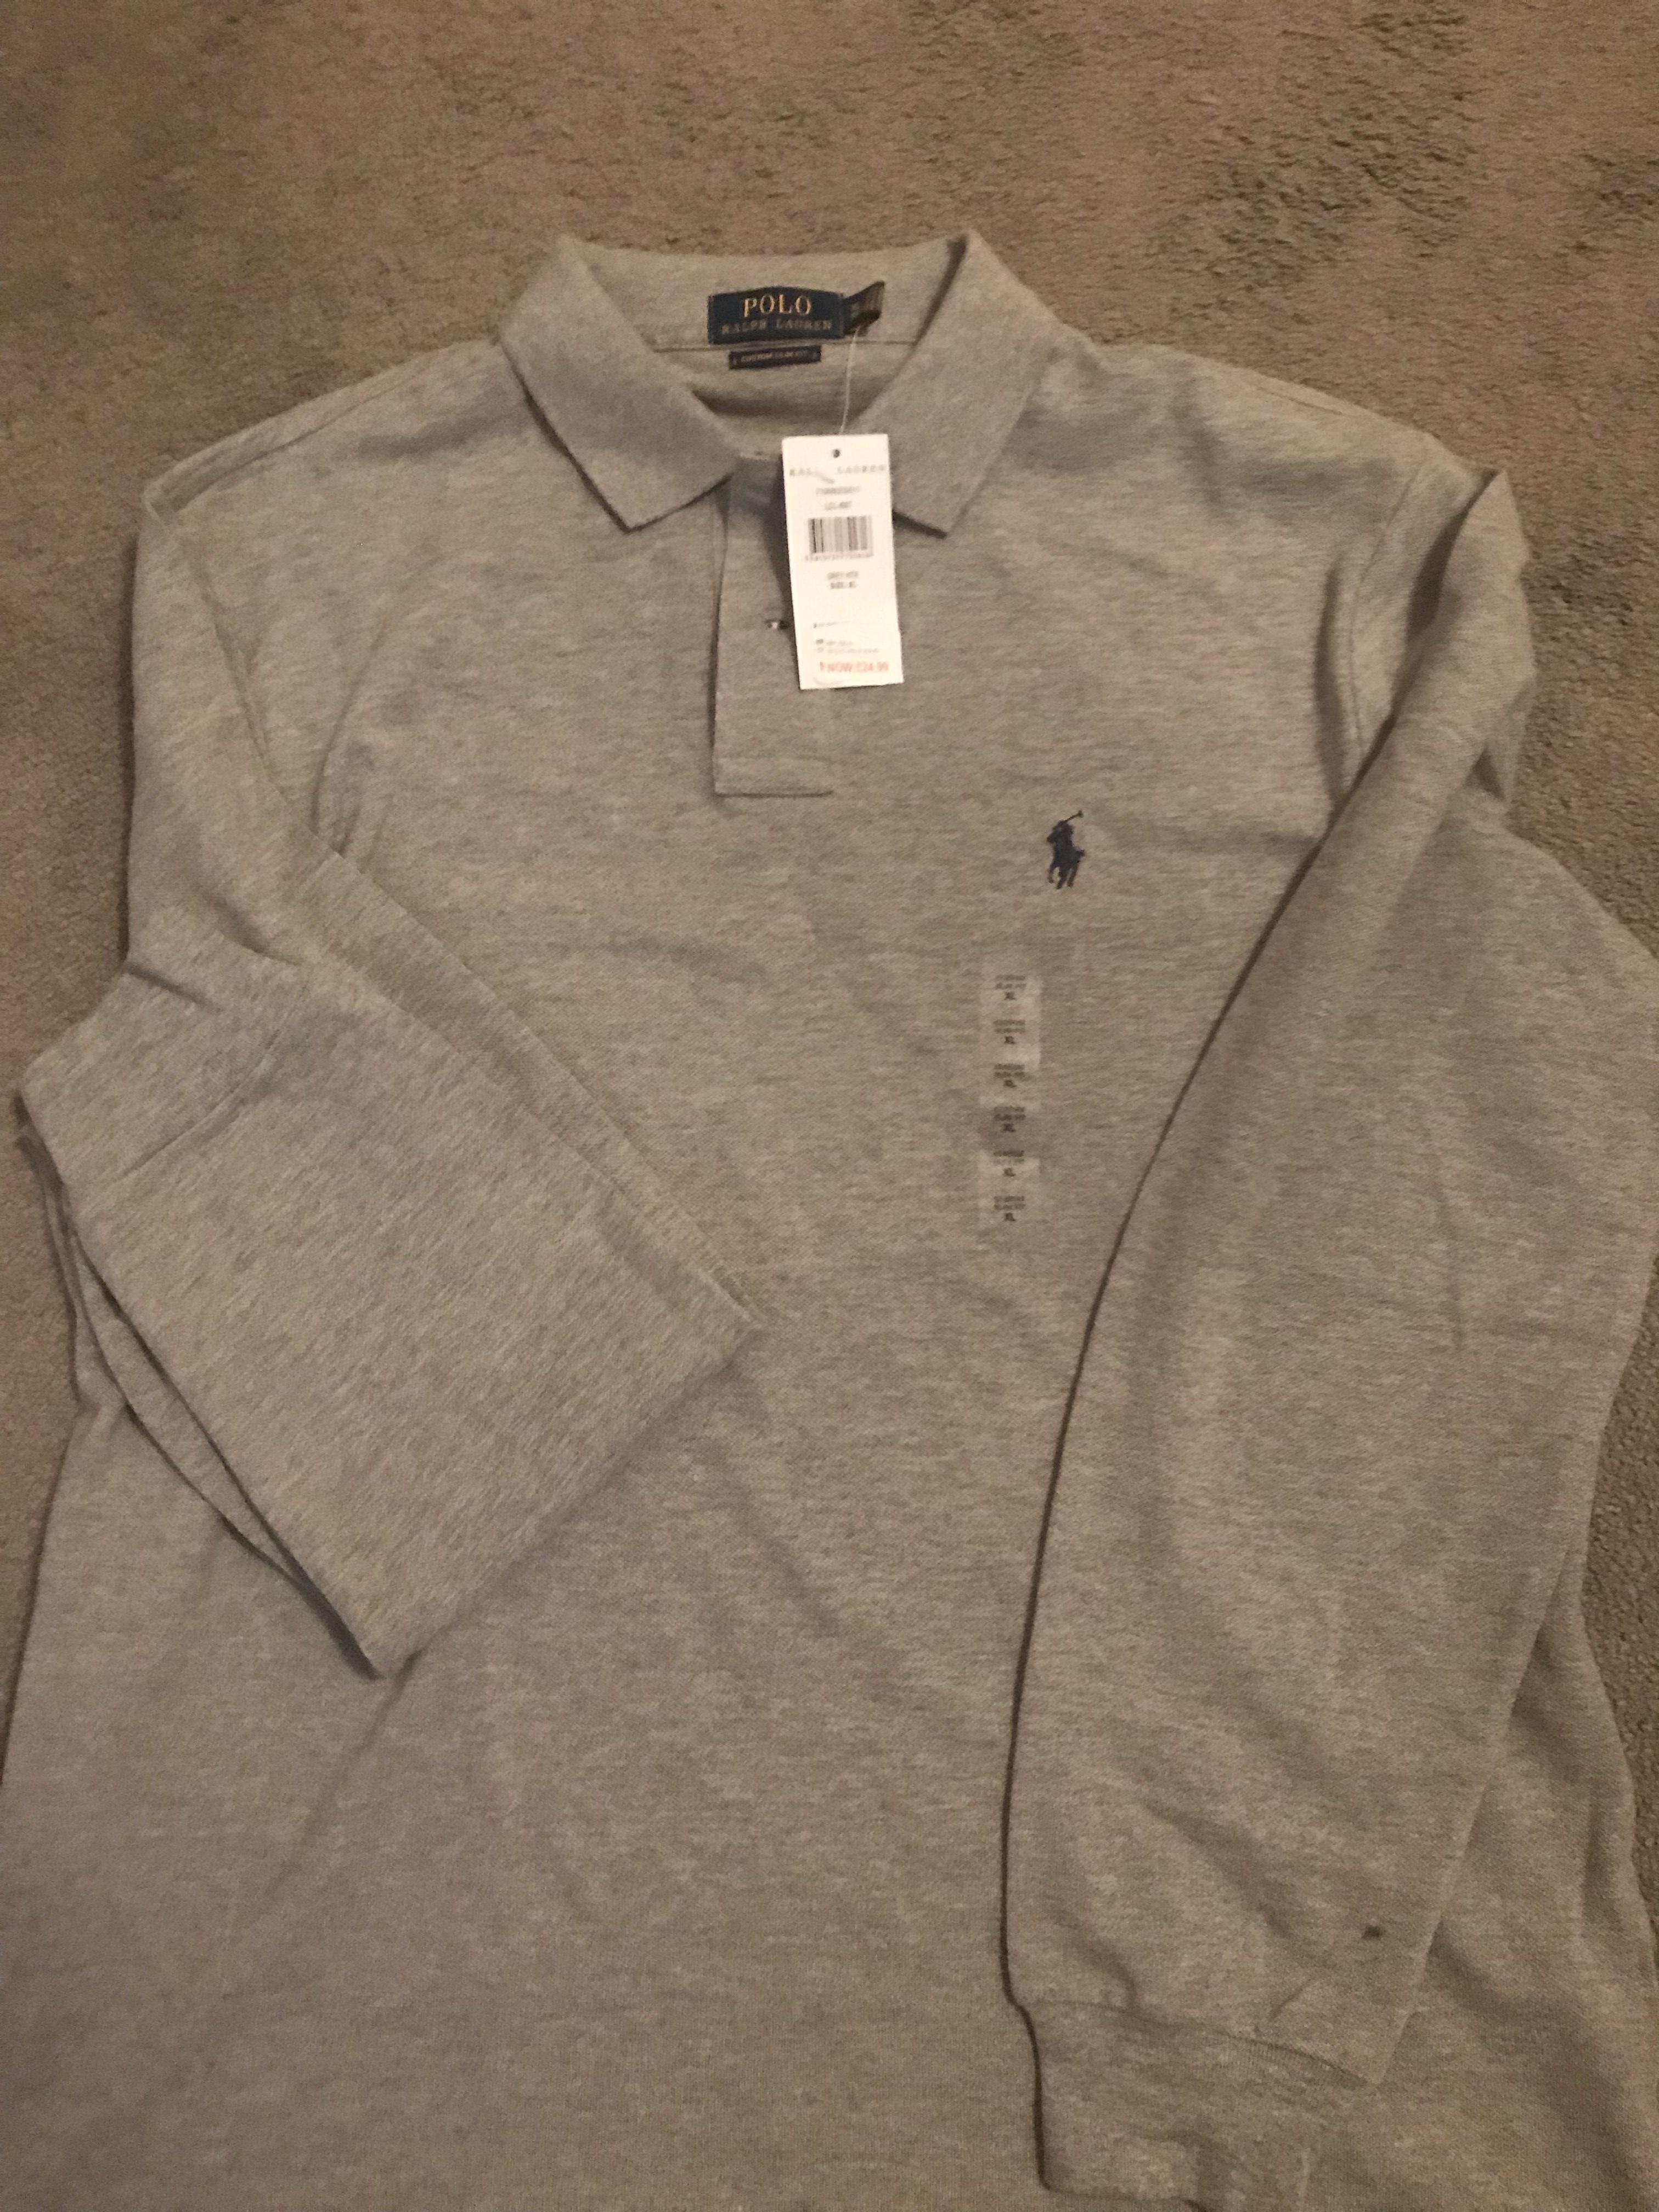 Ralph Lauren L/S polo shirt - £24.99 instore @ Ralph Lauren Cheshire Oaks Outlet (instore)